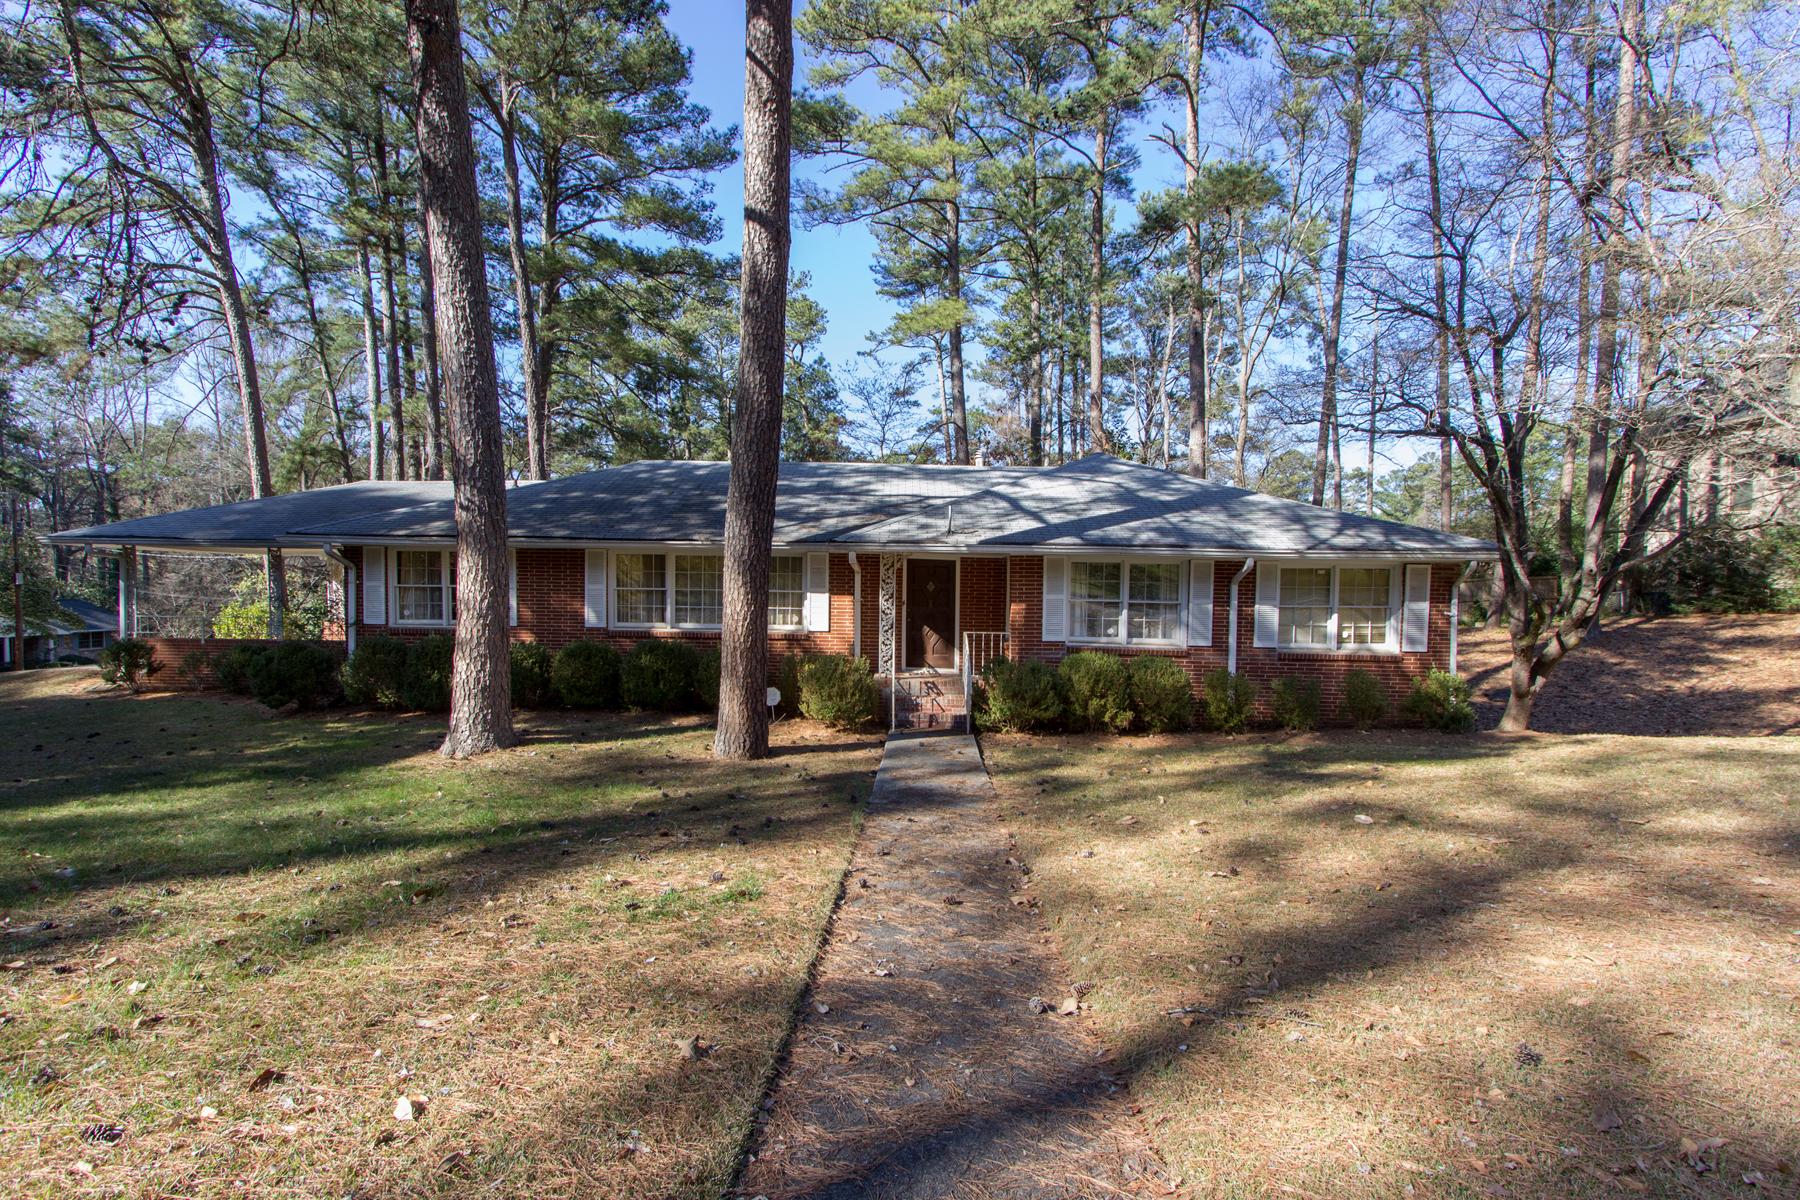 獨棟家庭住宅 為 出售 在 All Brick Home In Amazing Location 1412 Dalewood Drive NE Atlanta, 喬治亞州, 30329 美國